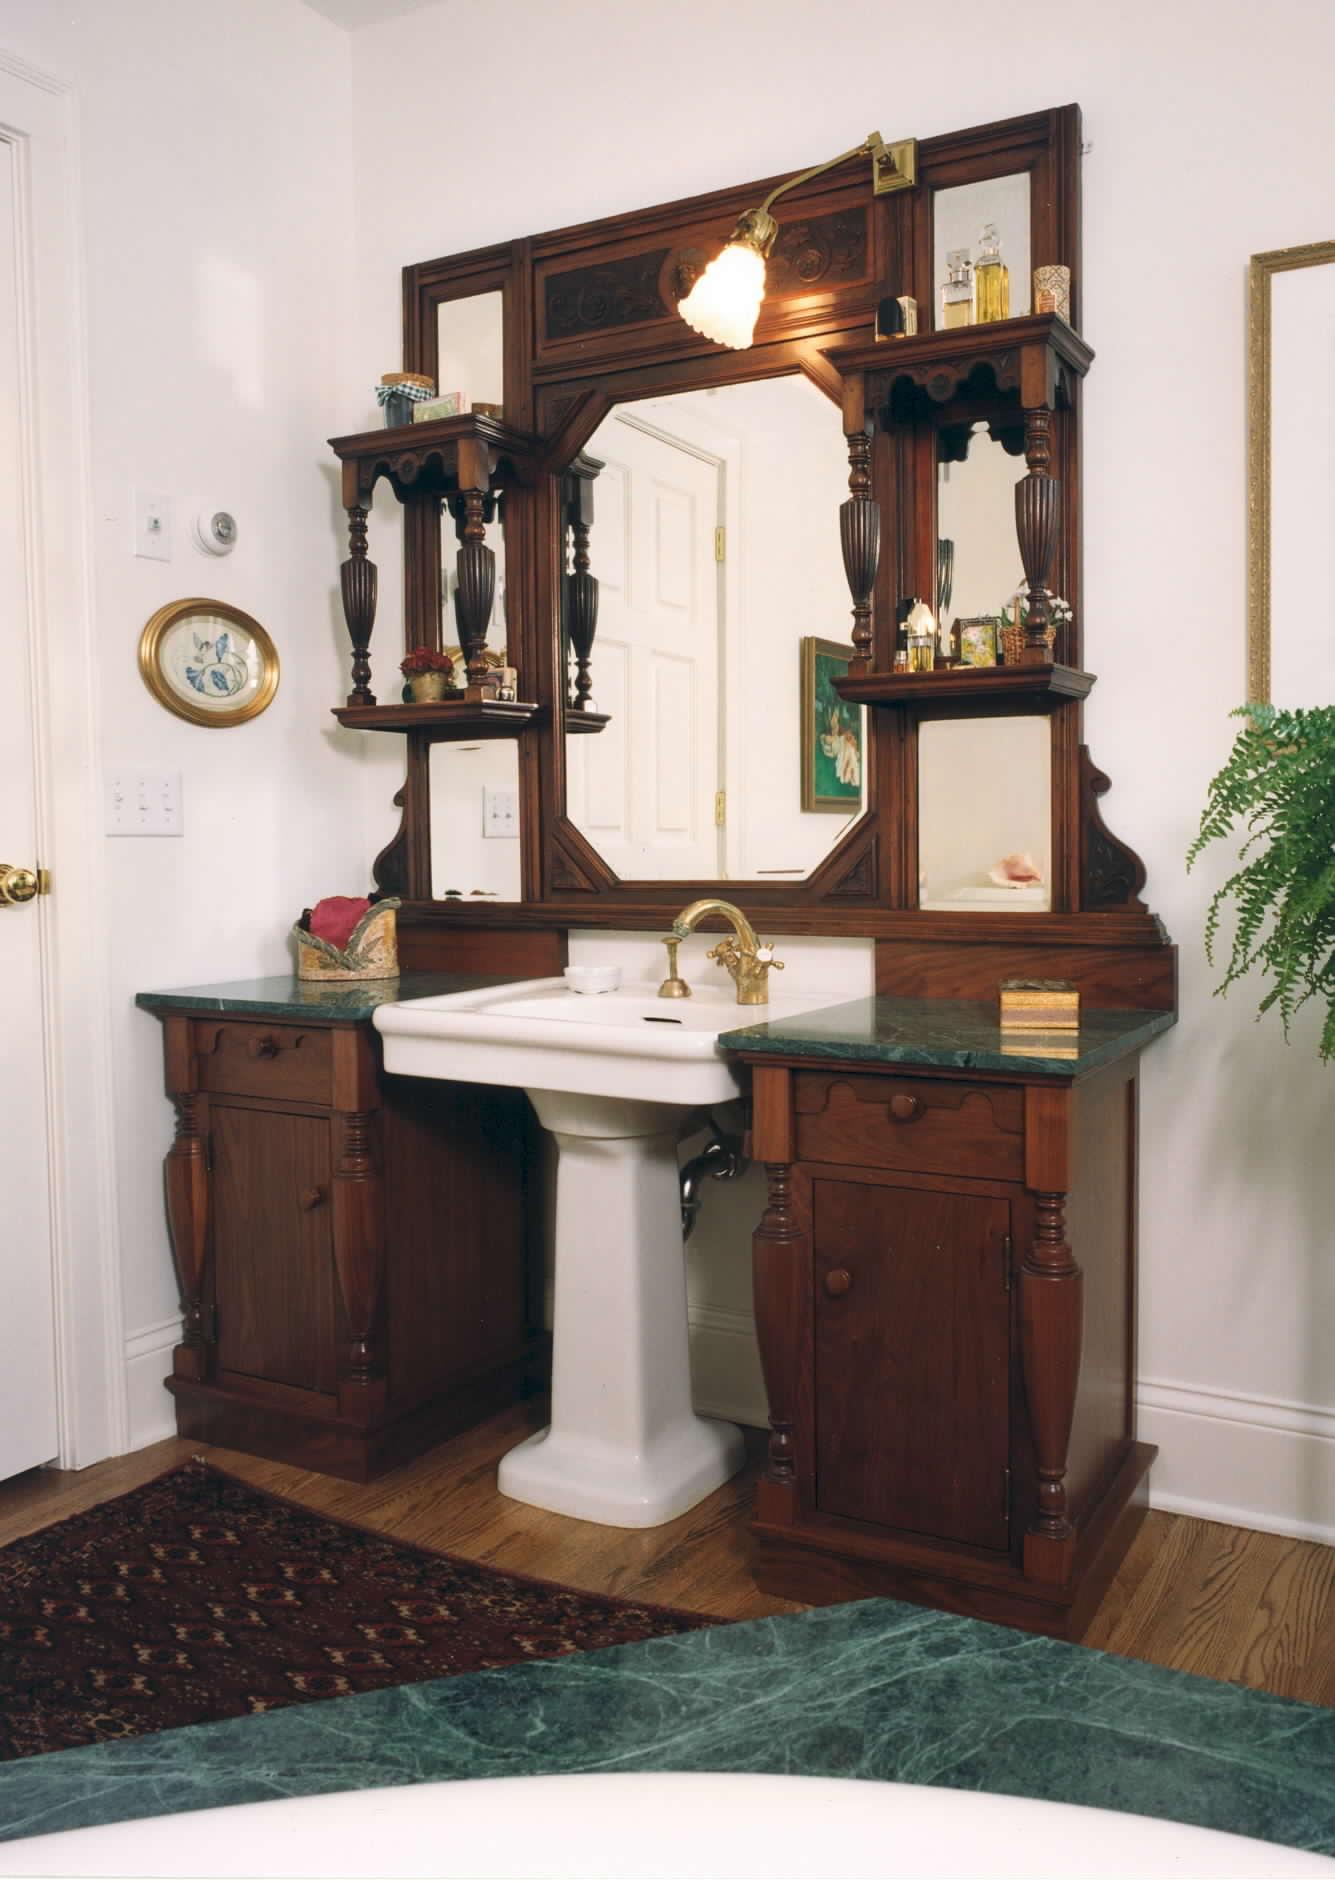 Whole-Builders-Bath-Remodel-sink-furniture